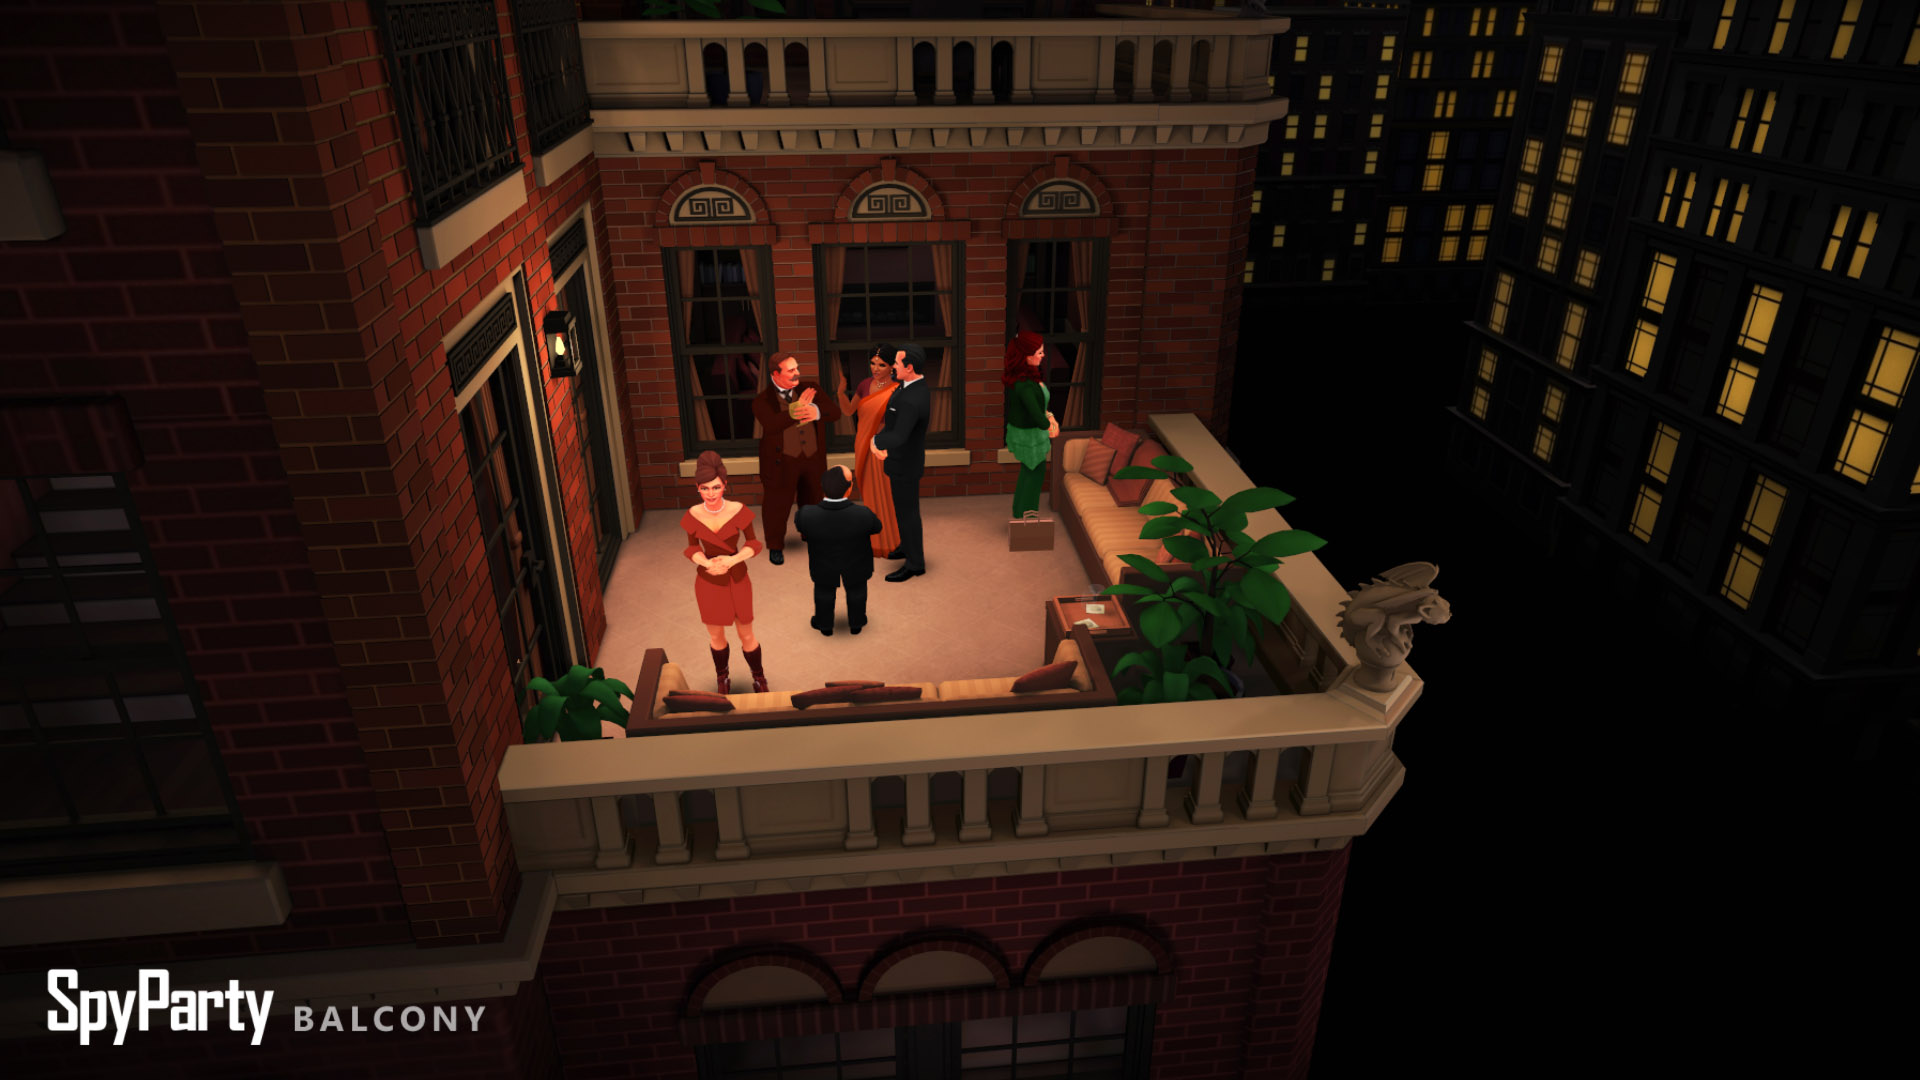 SpyParty – A Spy Game About Subtle Behavior » Blog